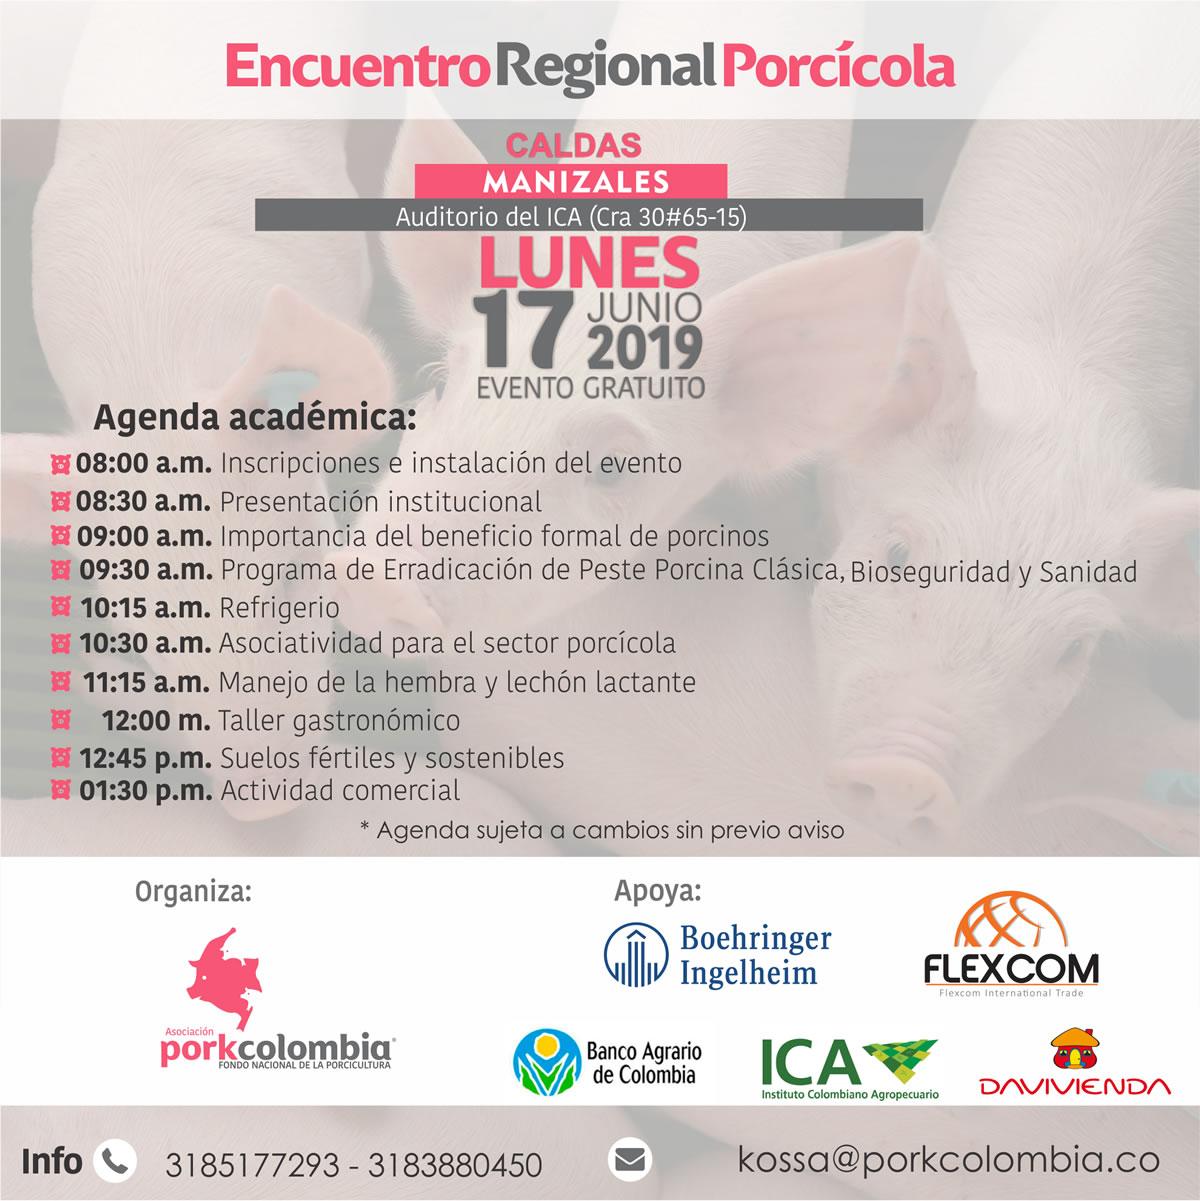 https://www.porkcolombia.co/wp-content/uploads/2019/06/Agenda_17dejunioo_MANIZALES.jpg